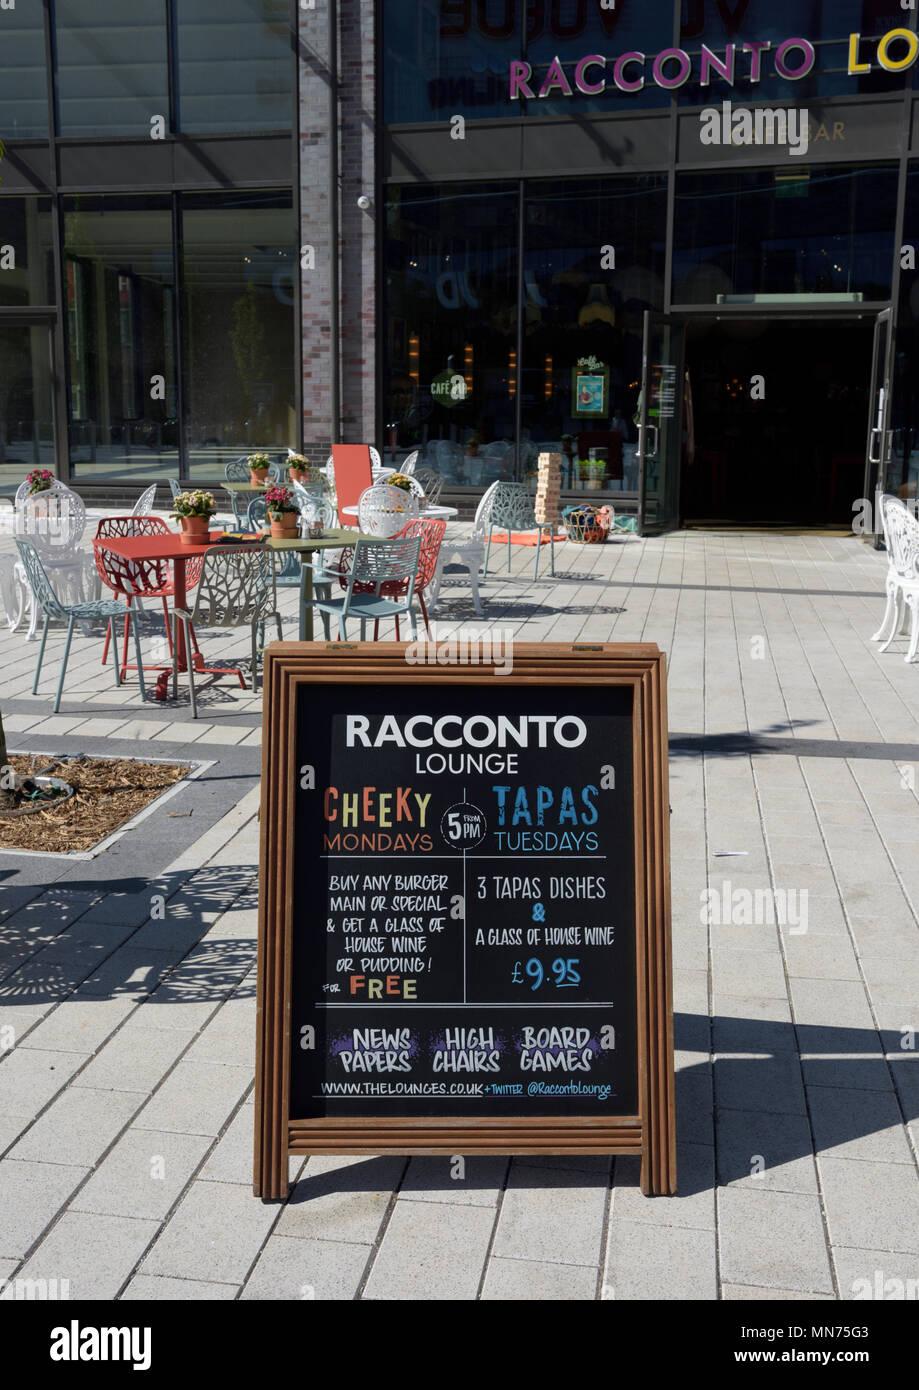 Racconto lounge chalkboard sign on pedestrianized area in bury lancashire - Stock Image